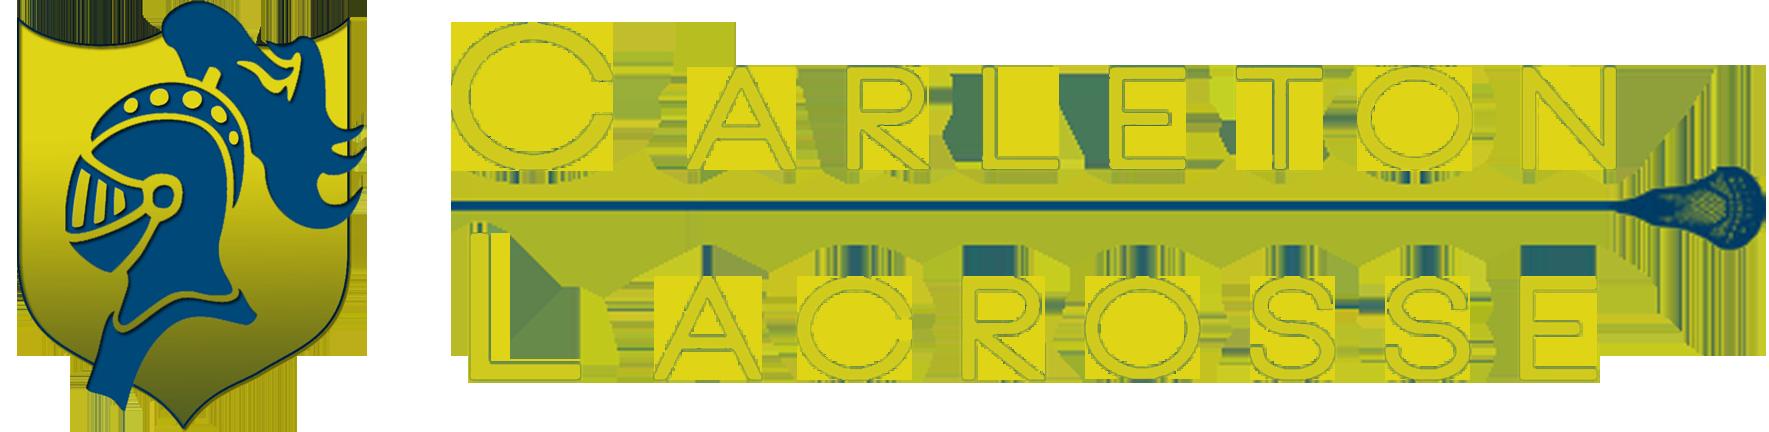 Carleton Lacrosse